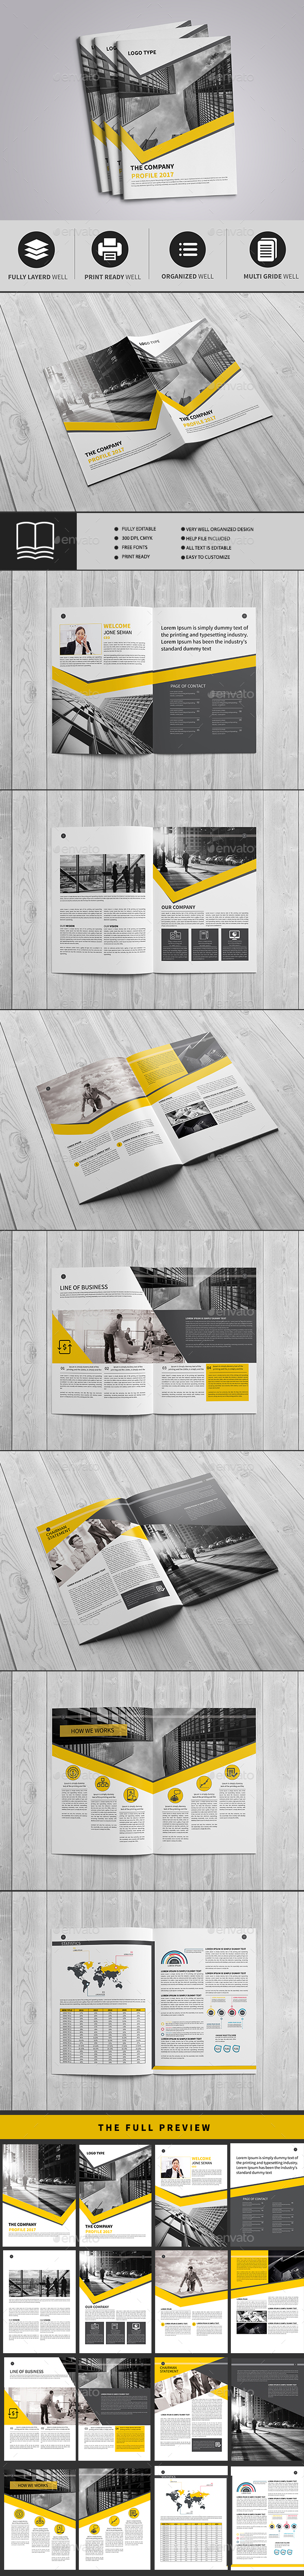 Company Profile A4 - Brochures Print Templates